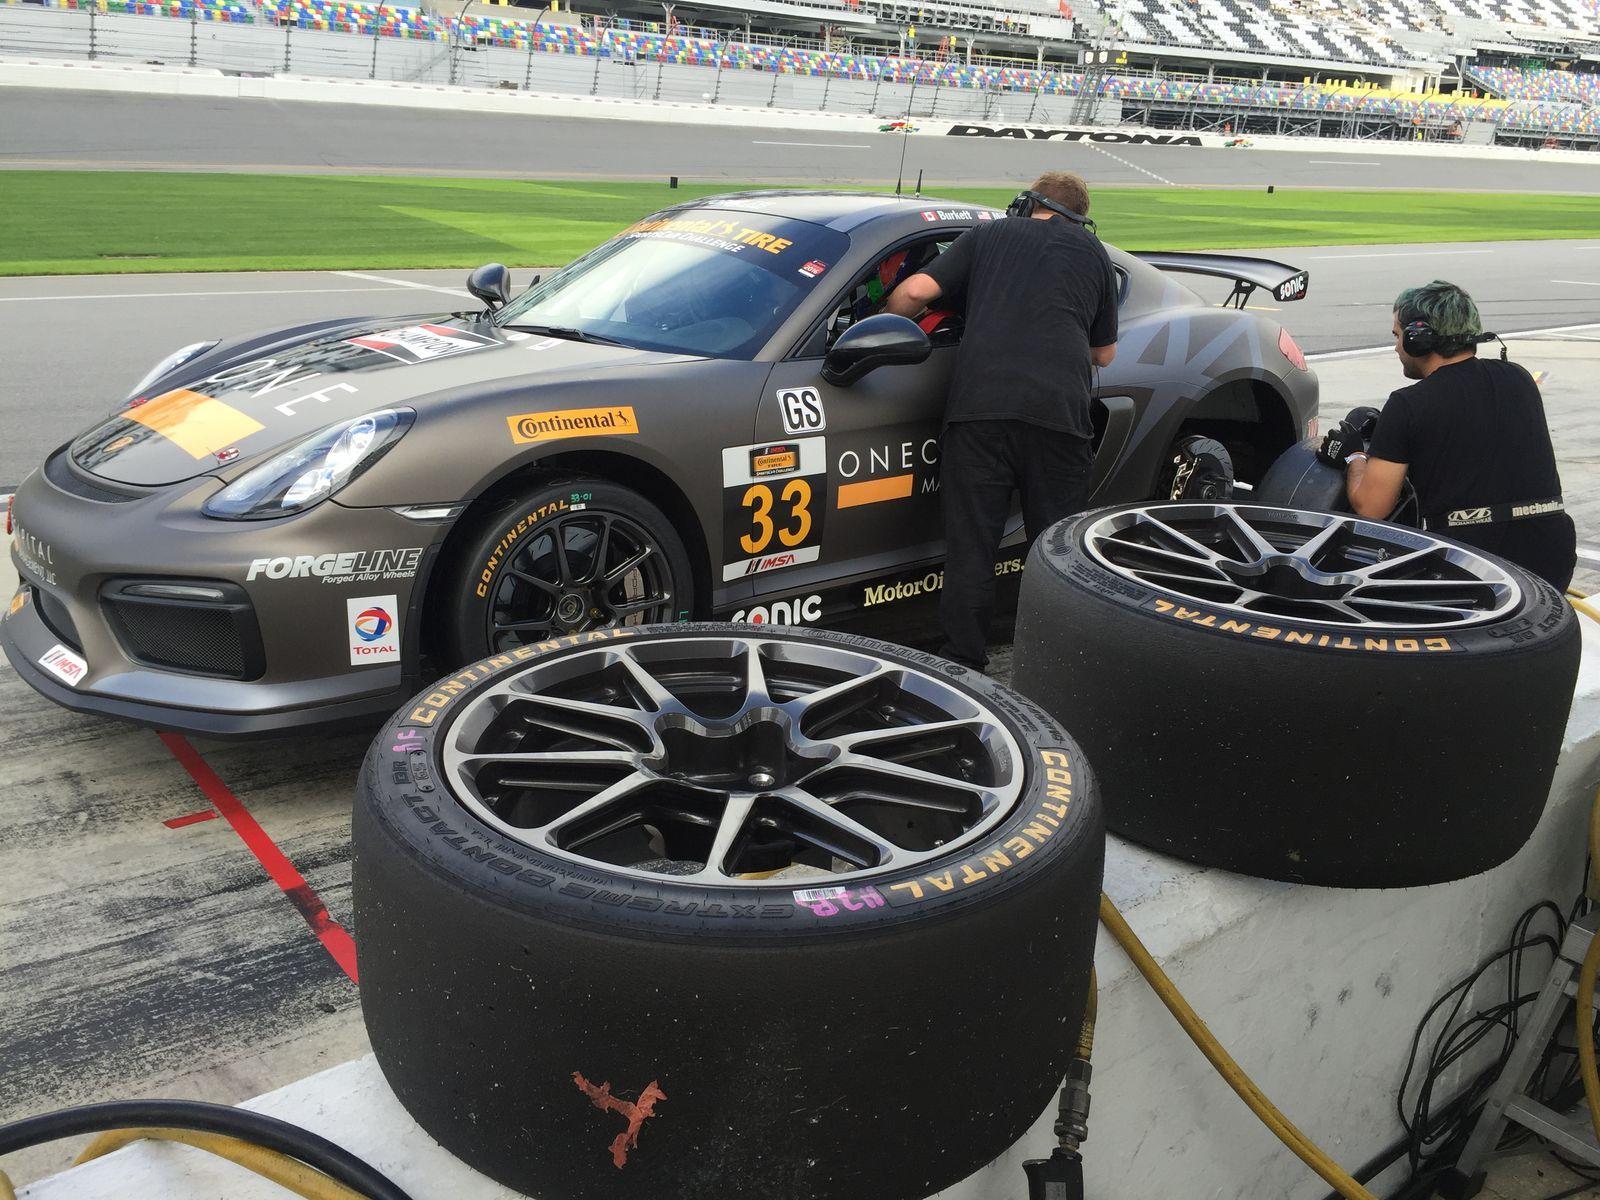 2016 Porsche Cayman | CJ Wilson Racing's GS Class Porsche Cayman Clubsport on Forgeline One PIece Forged Monoblock GS1R Wheels - Pit Stop